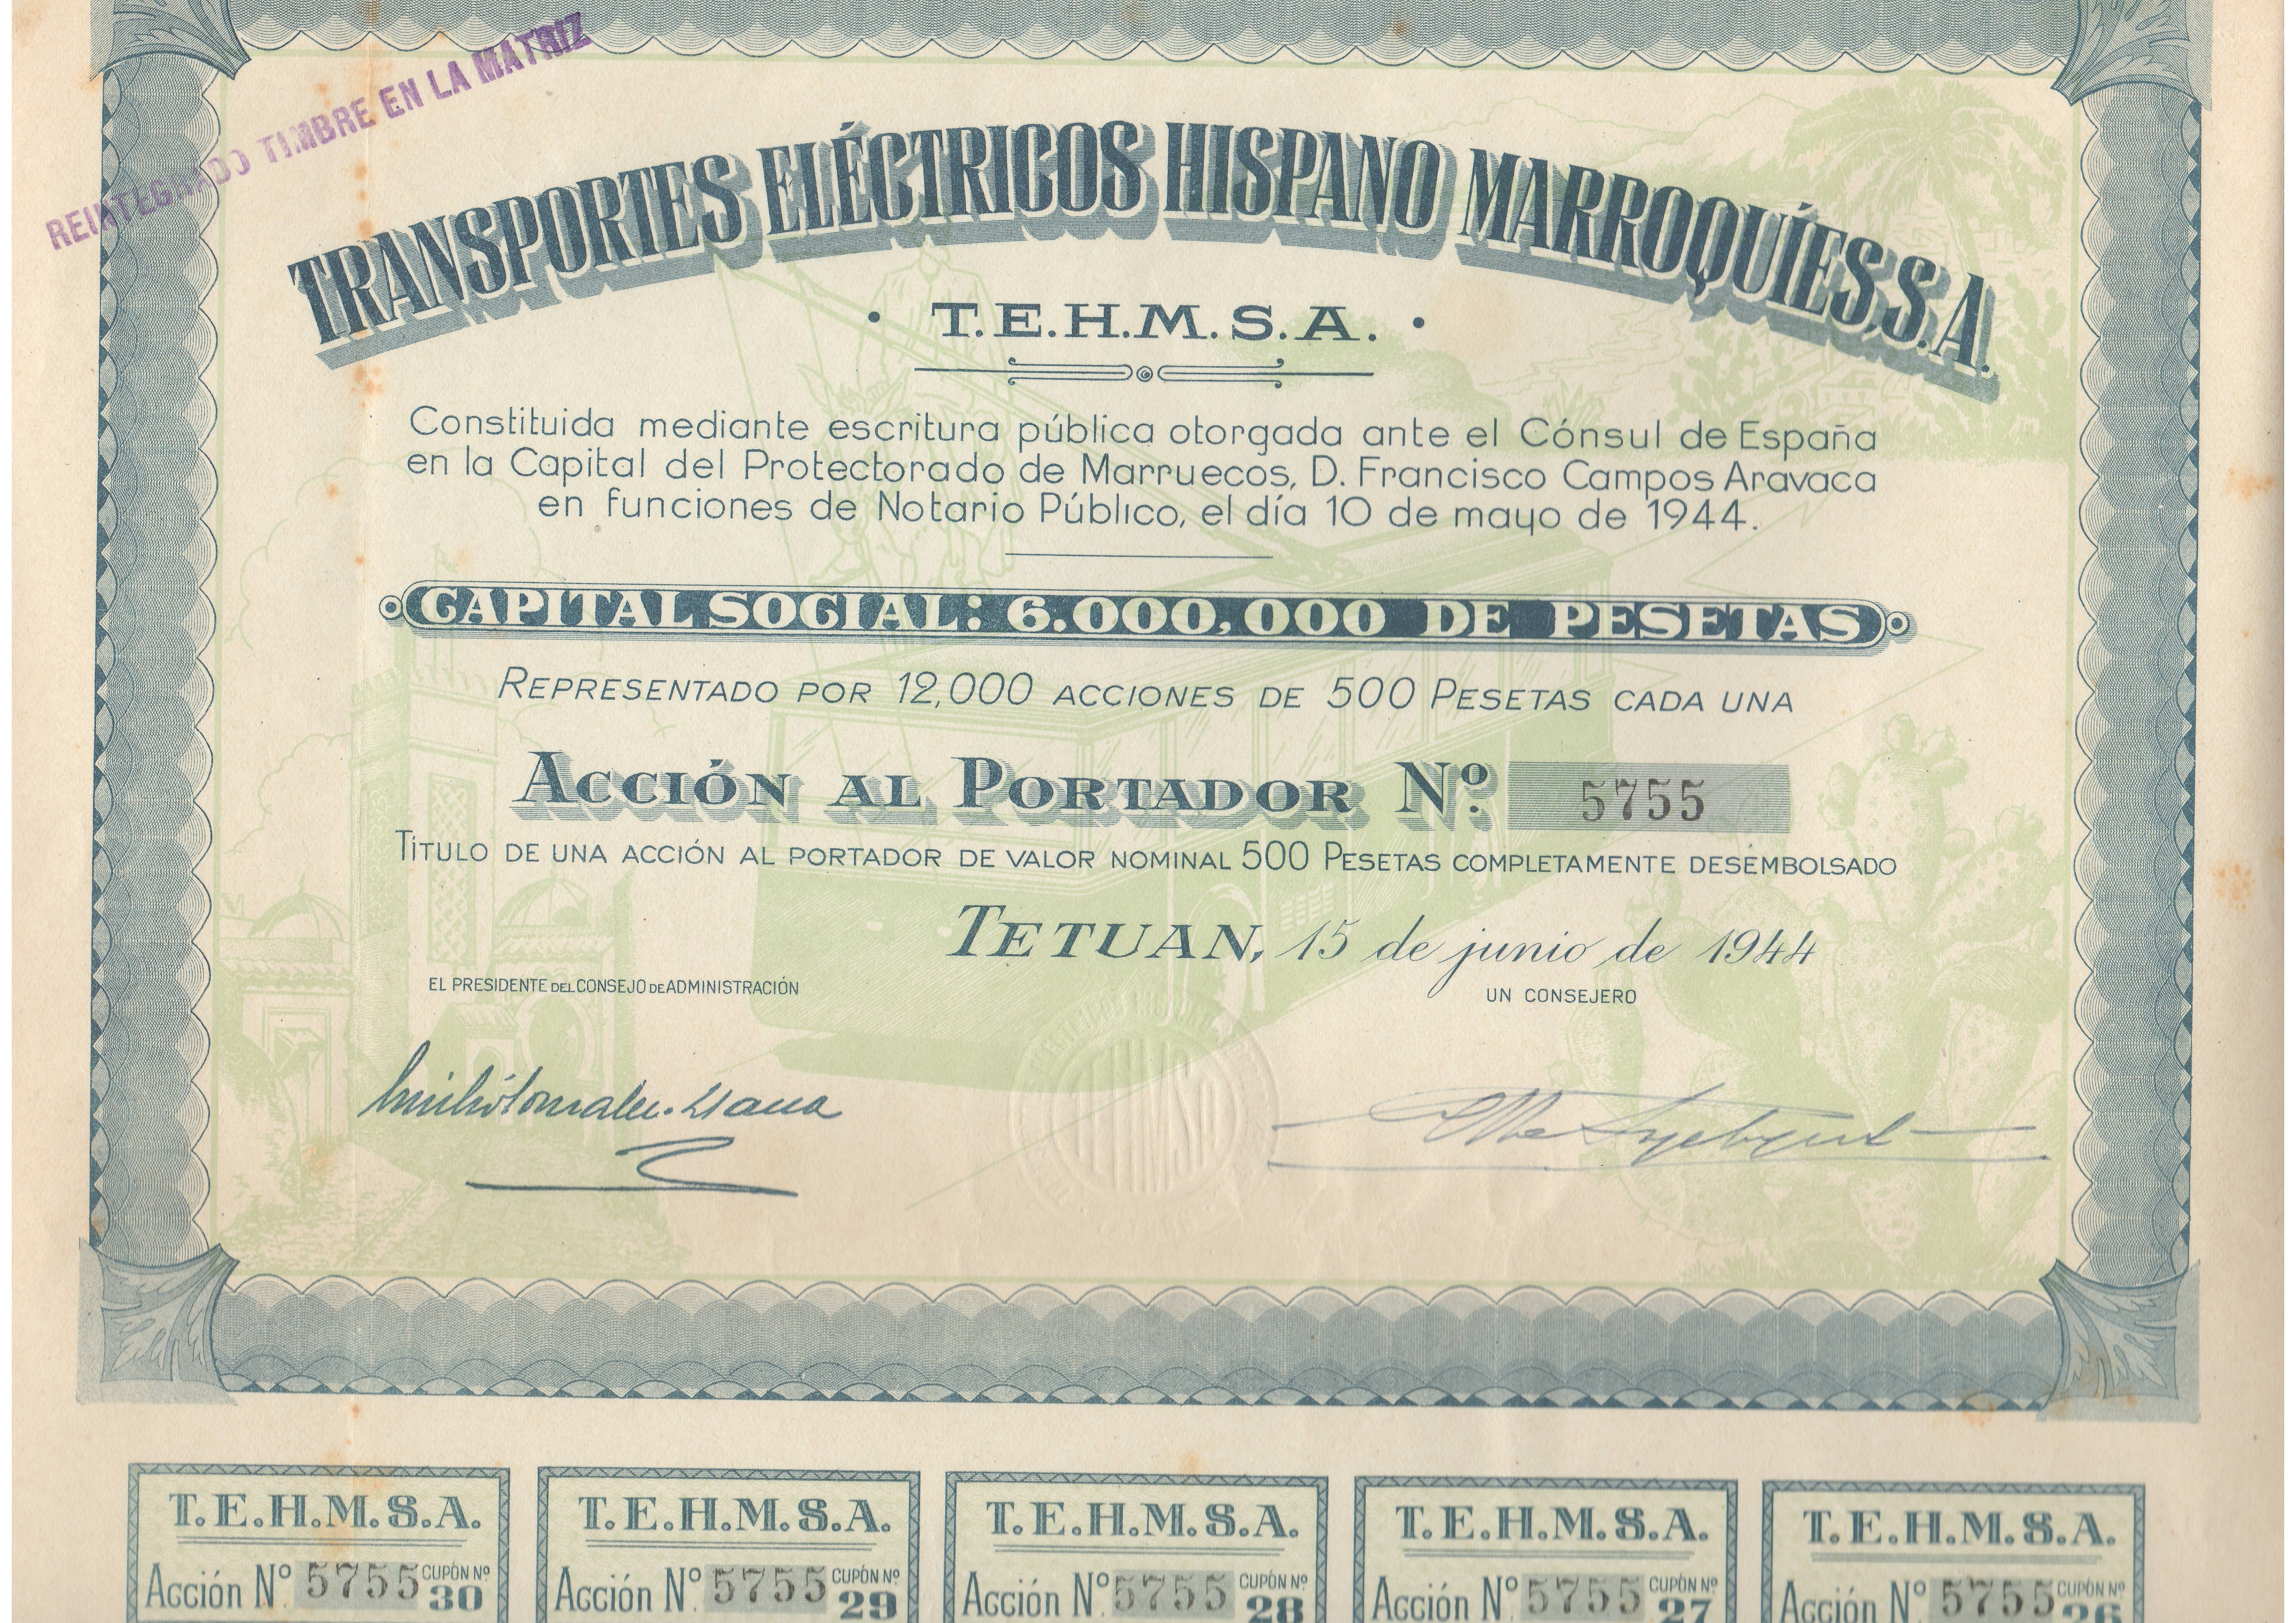 Transportes Eléctricos Hispano Marroquíes S.A.